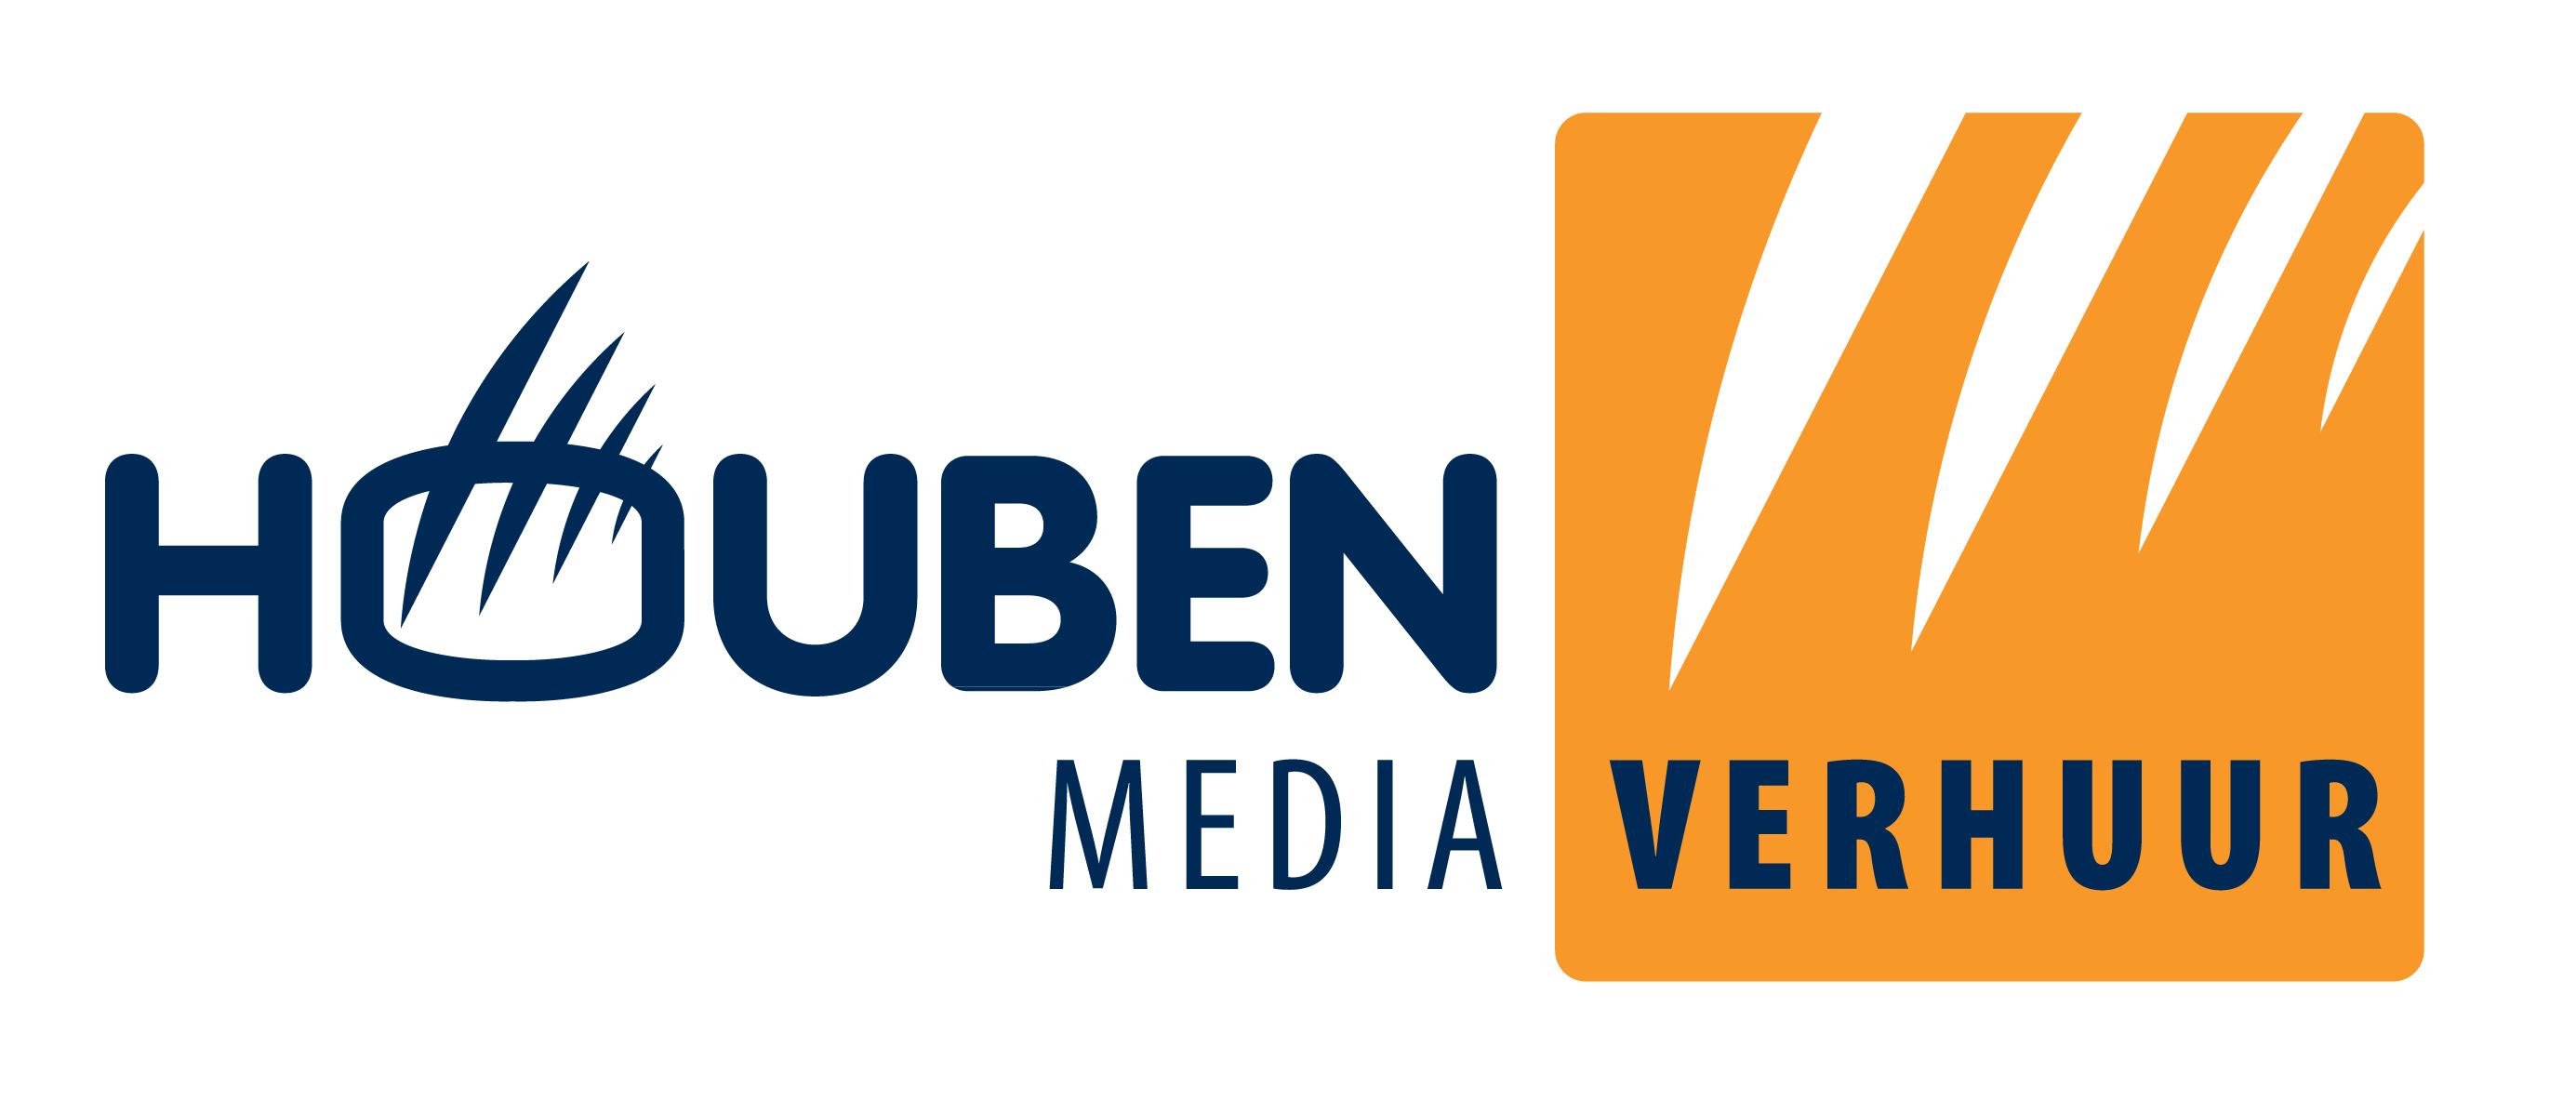 Houben Mediaverhuur logo 2011 HR